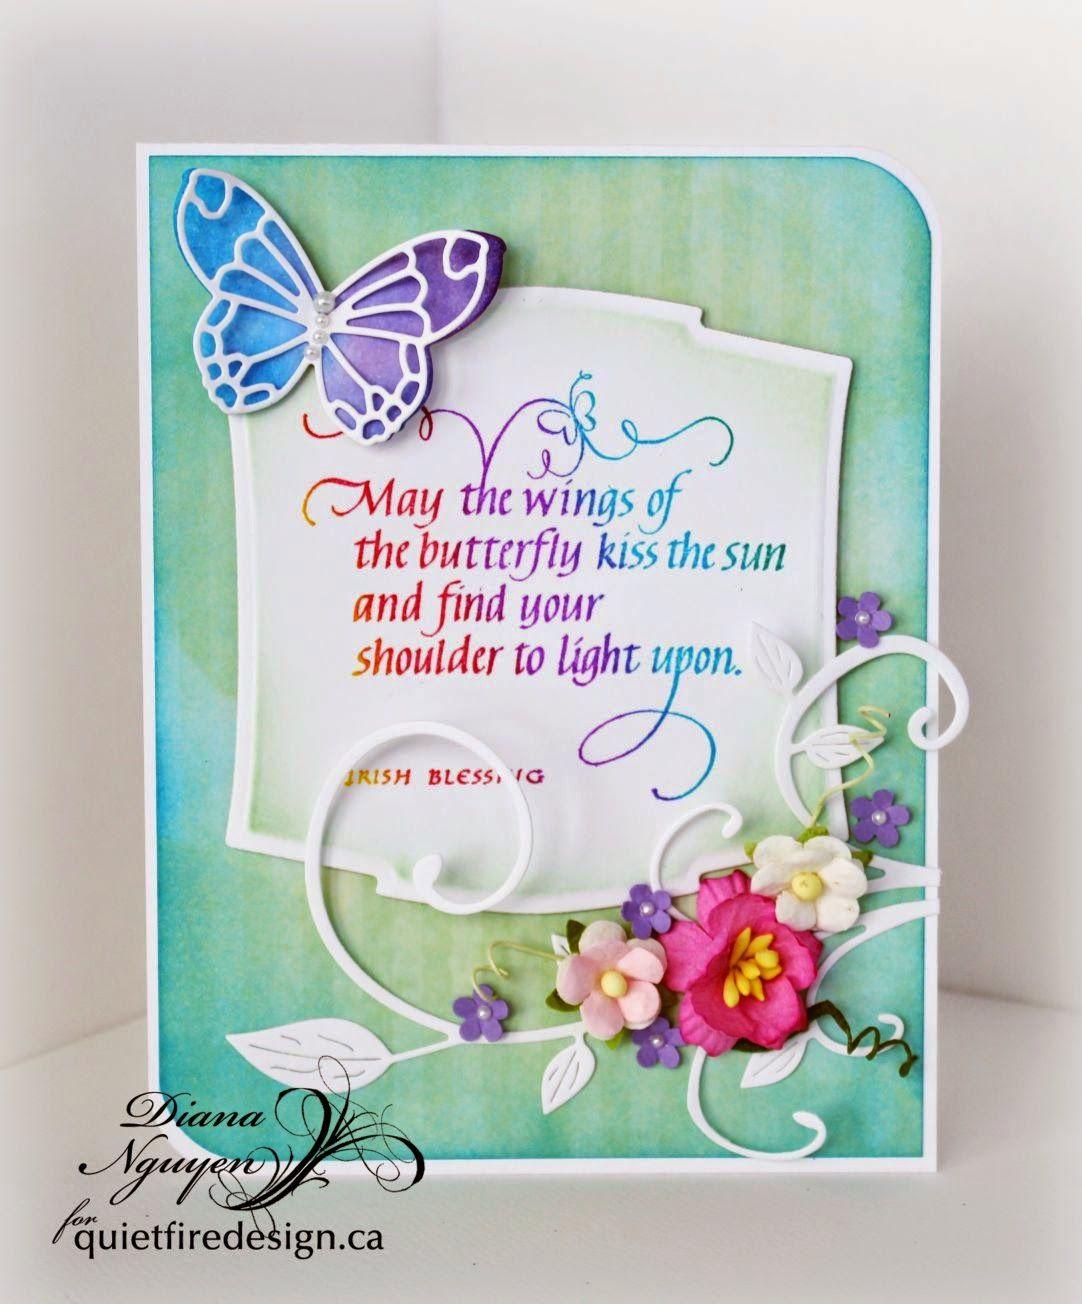 diana nguyen quietfire poppystamps spellbinders butterfly